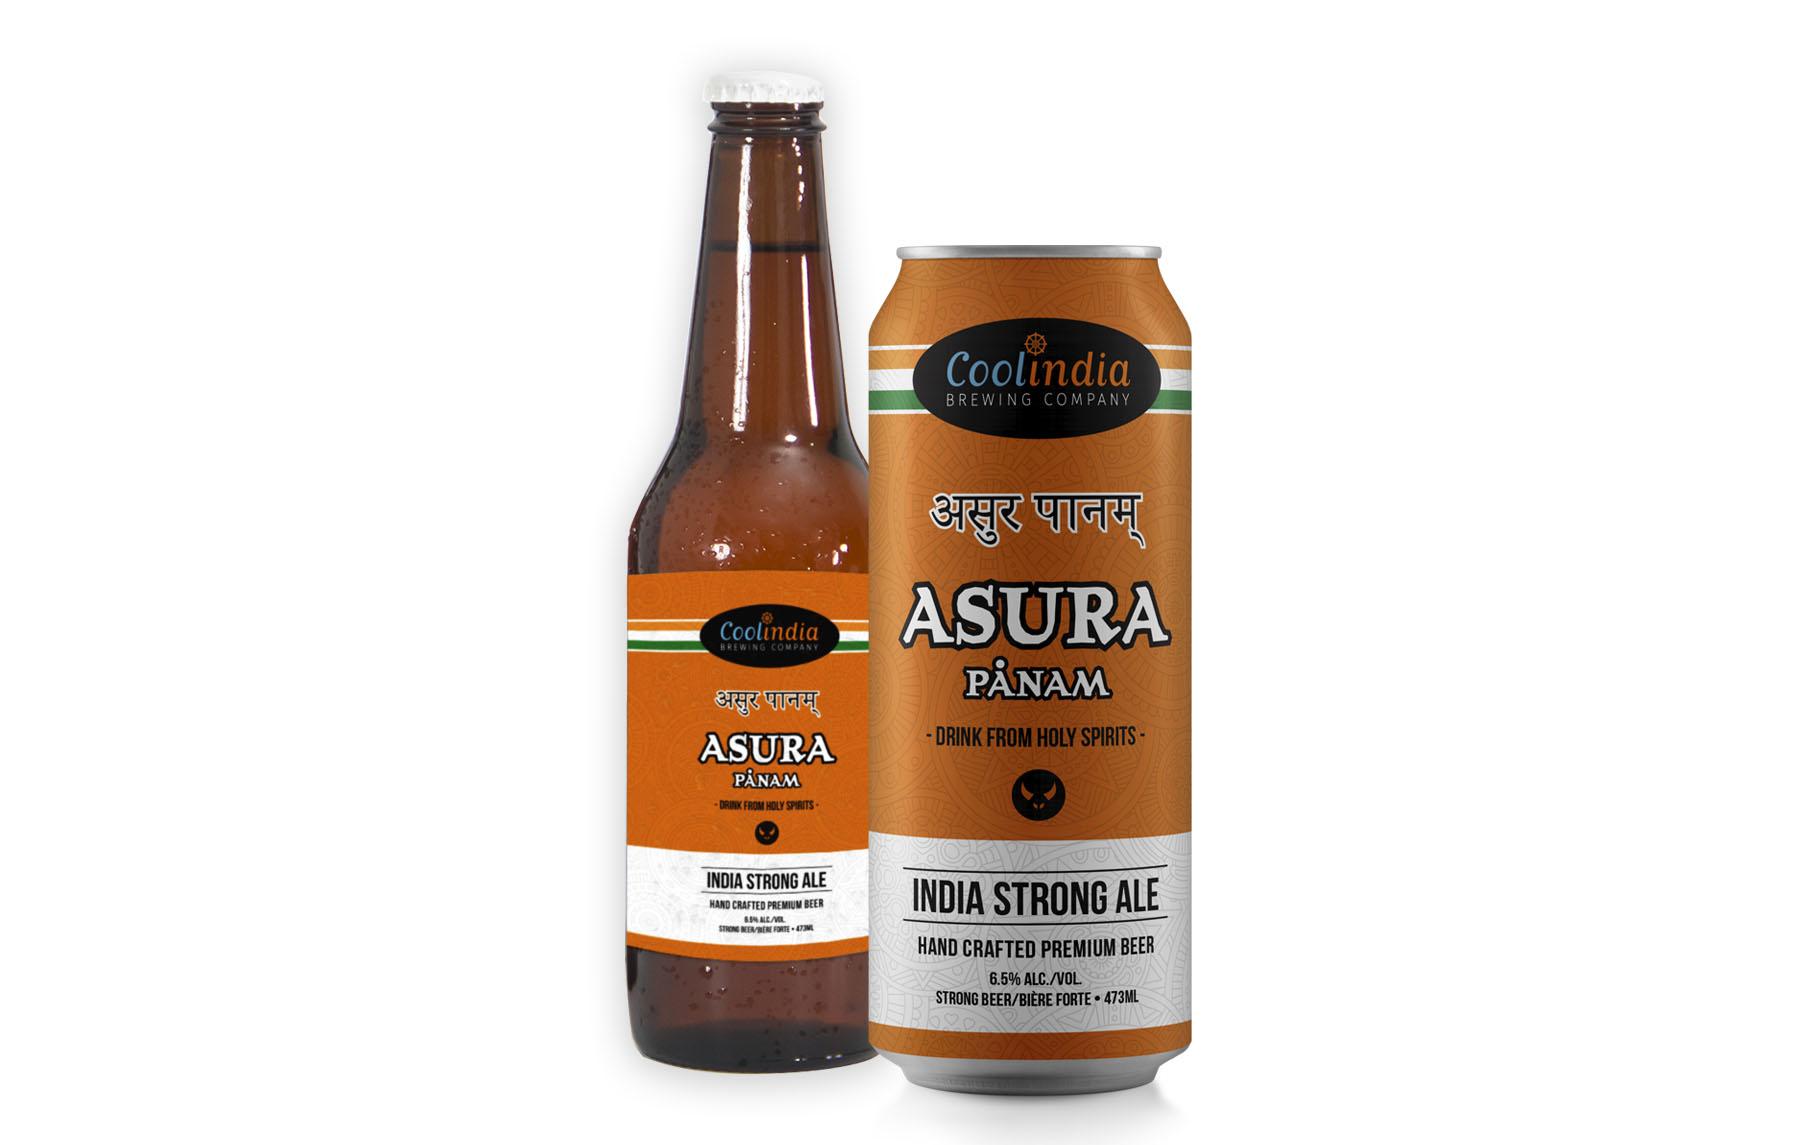 coolindia_bottles_mockup_asura